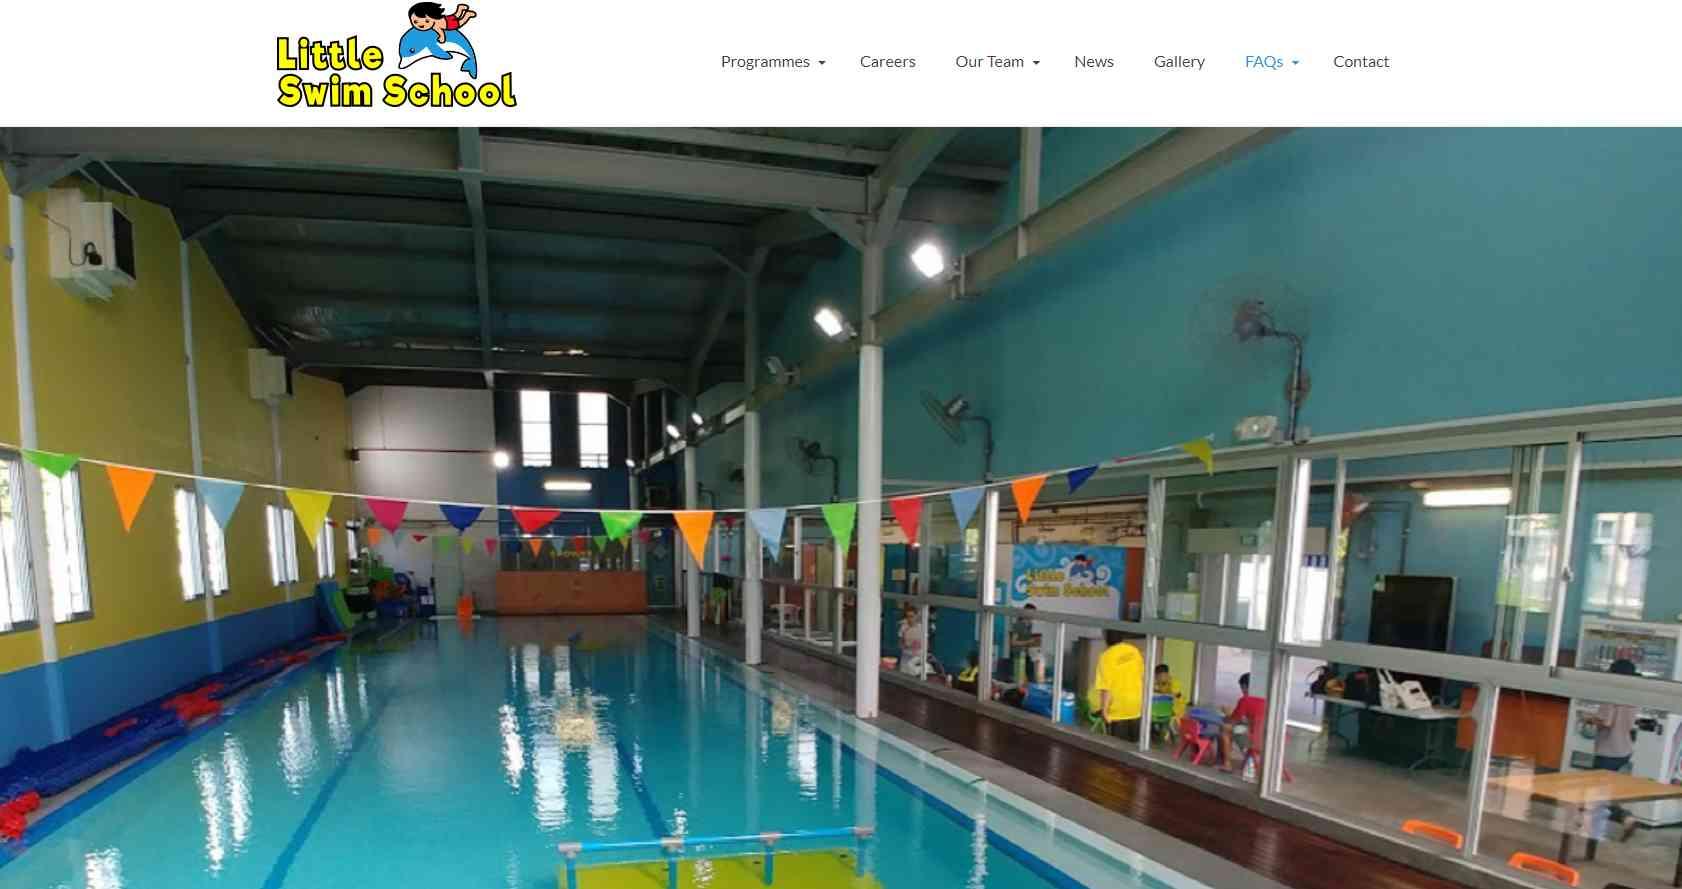 Little Swim School Top Swimming Schools in Singapore